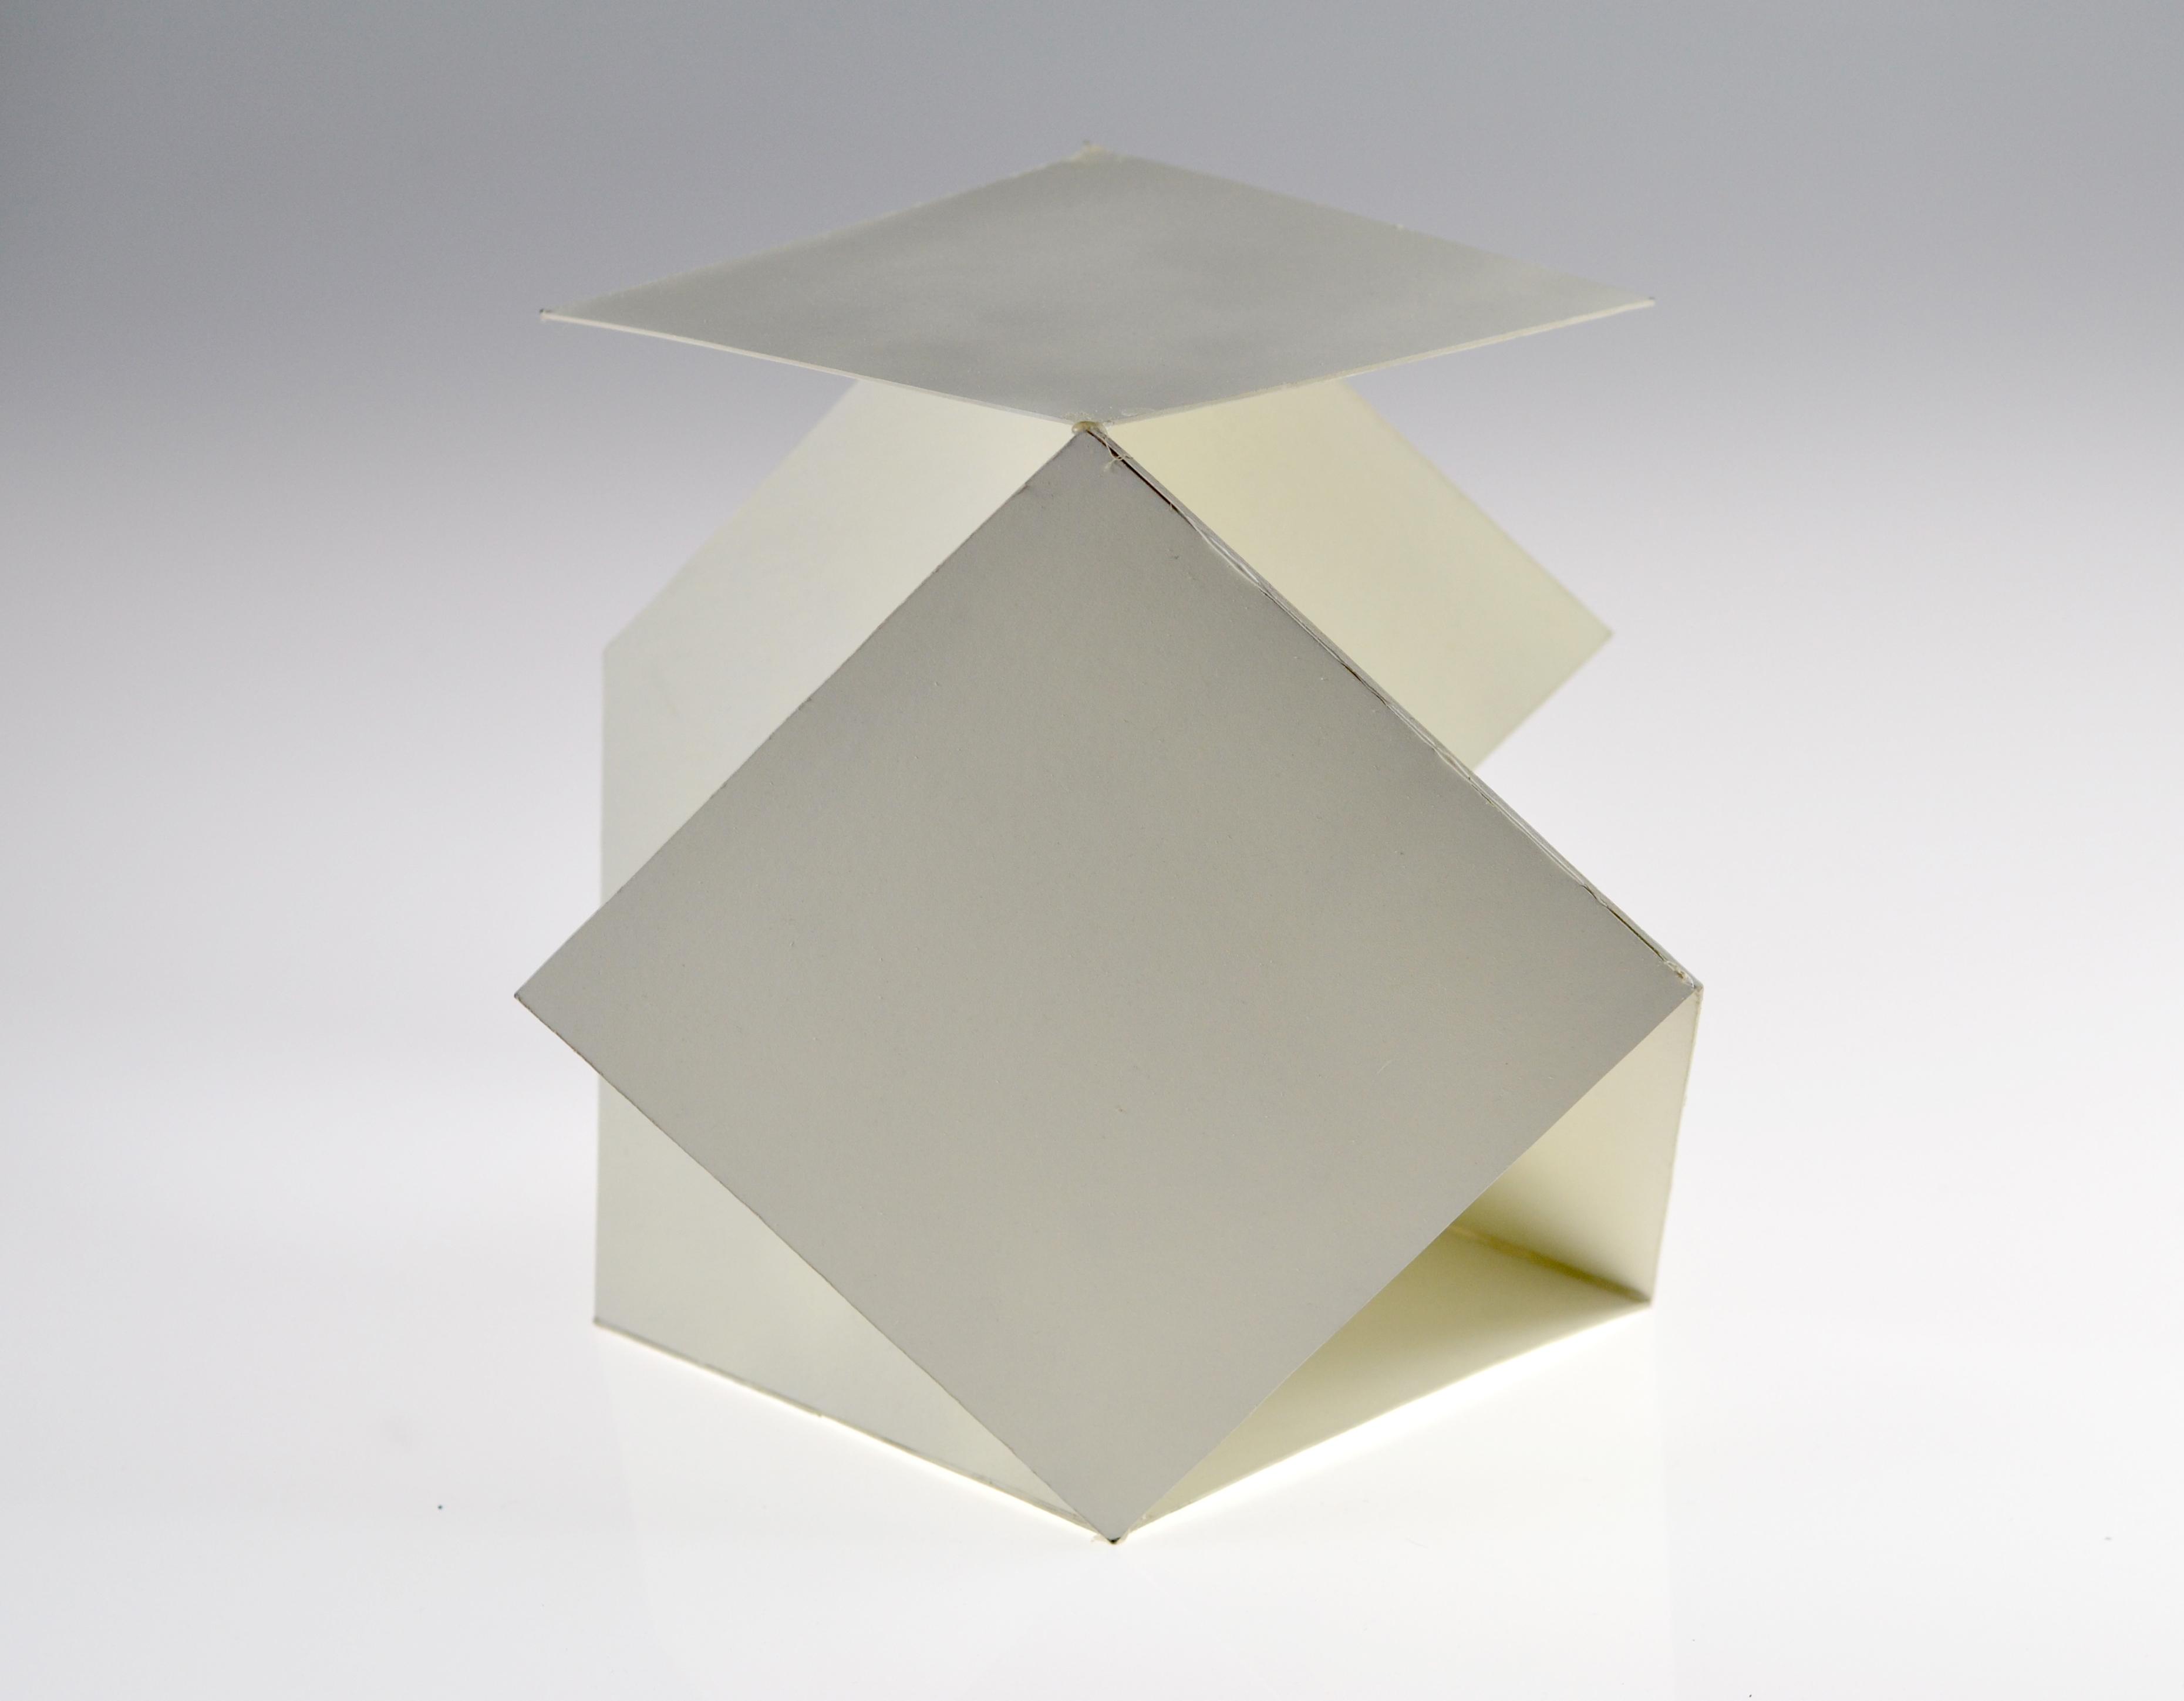 riley sykes - geometric spatial sculptures